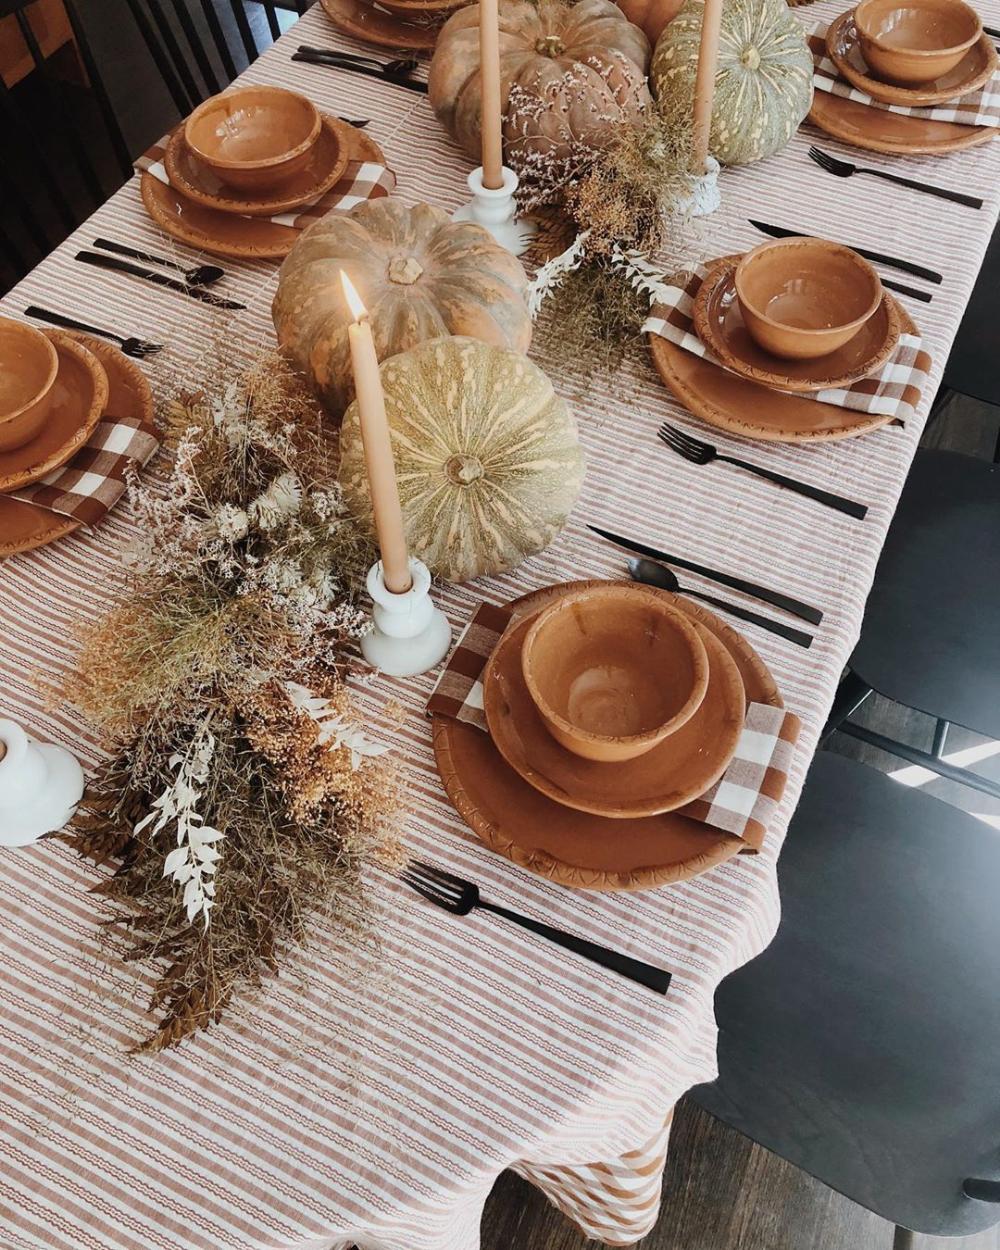 Instagram Festival bride, Getting cozy, Party decorations